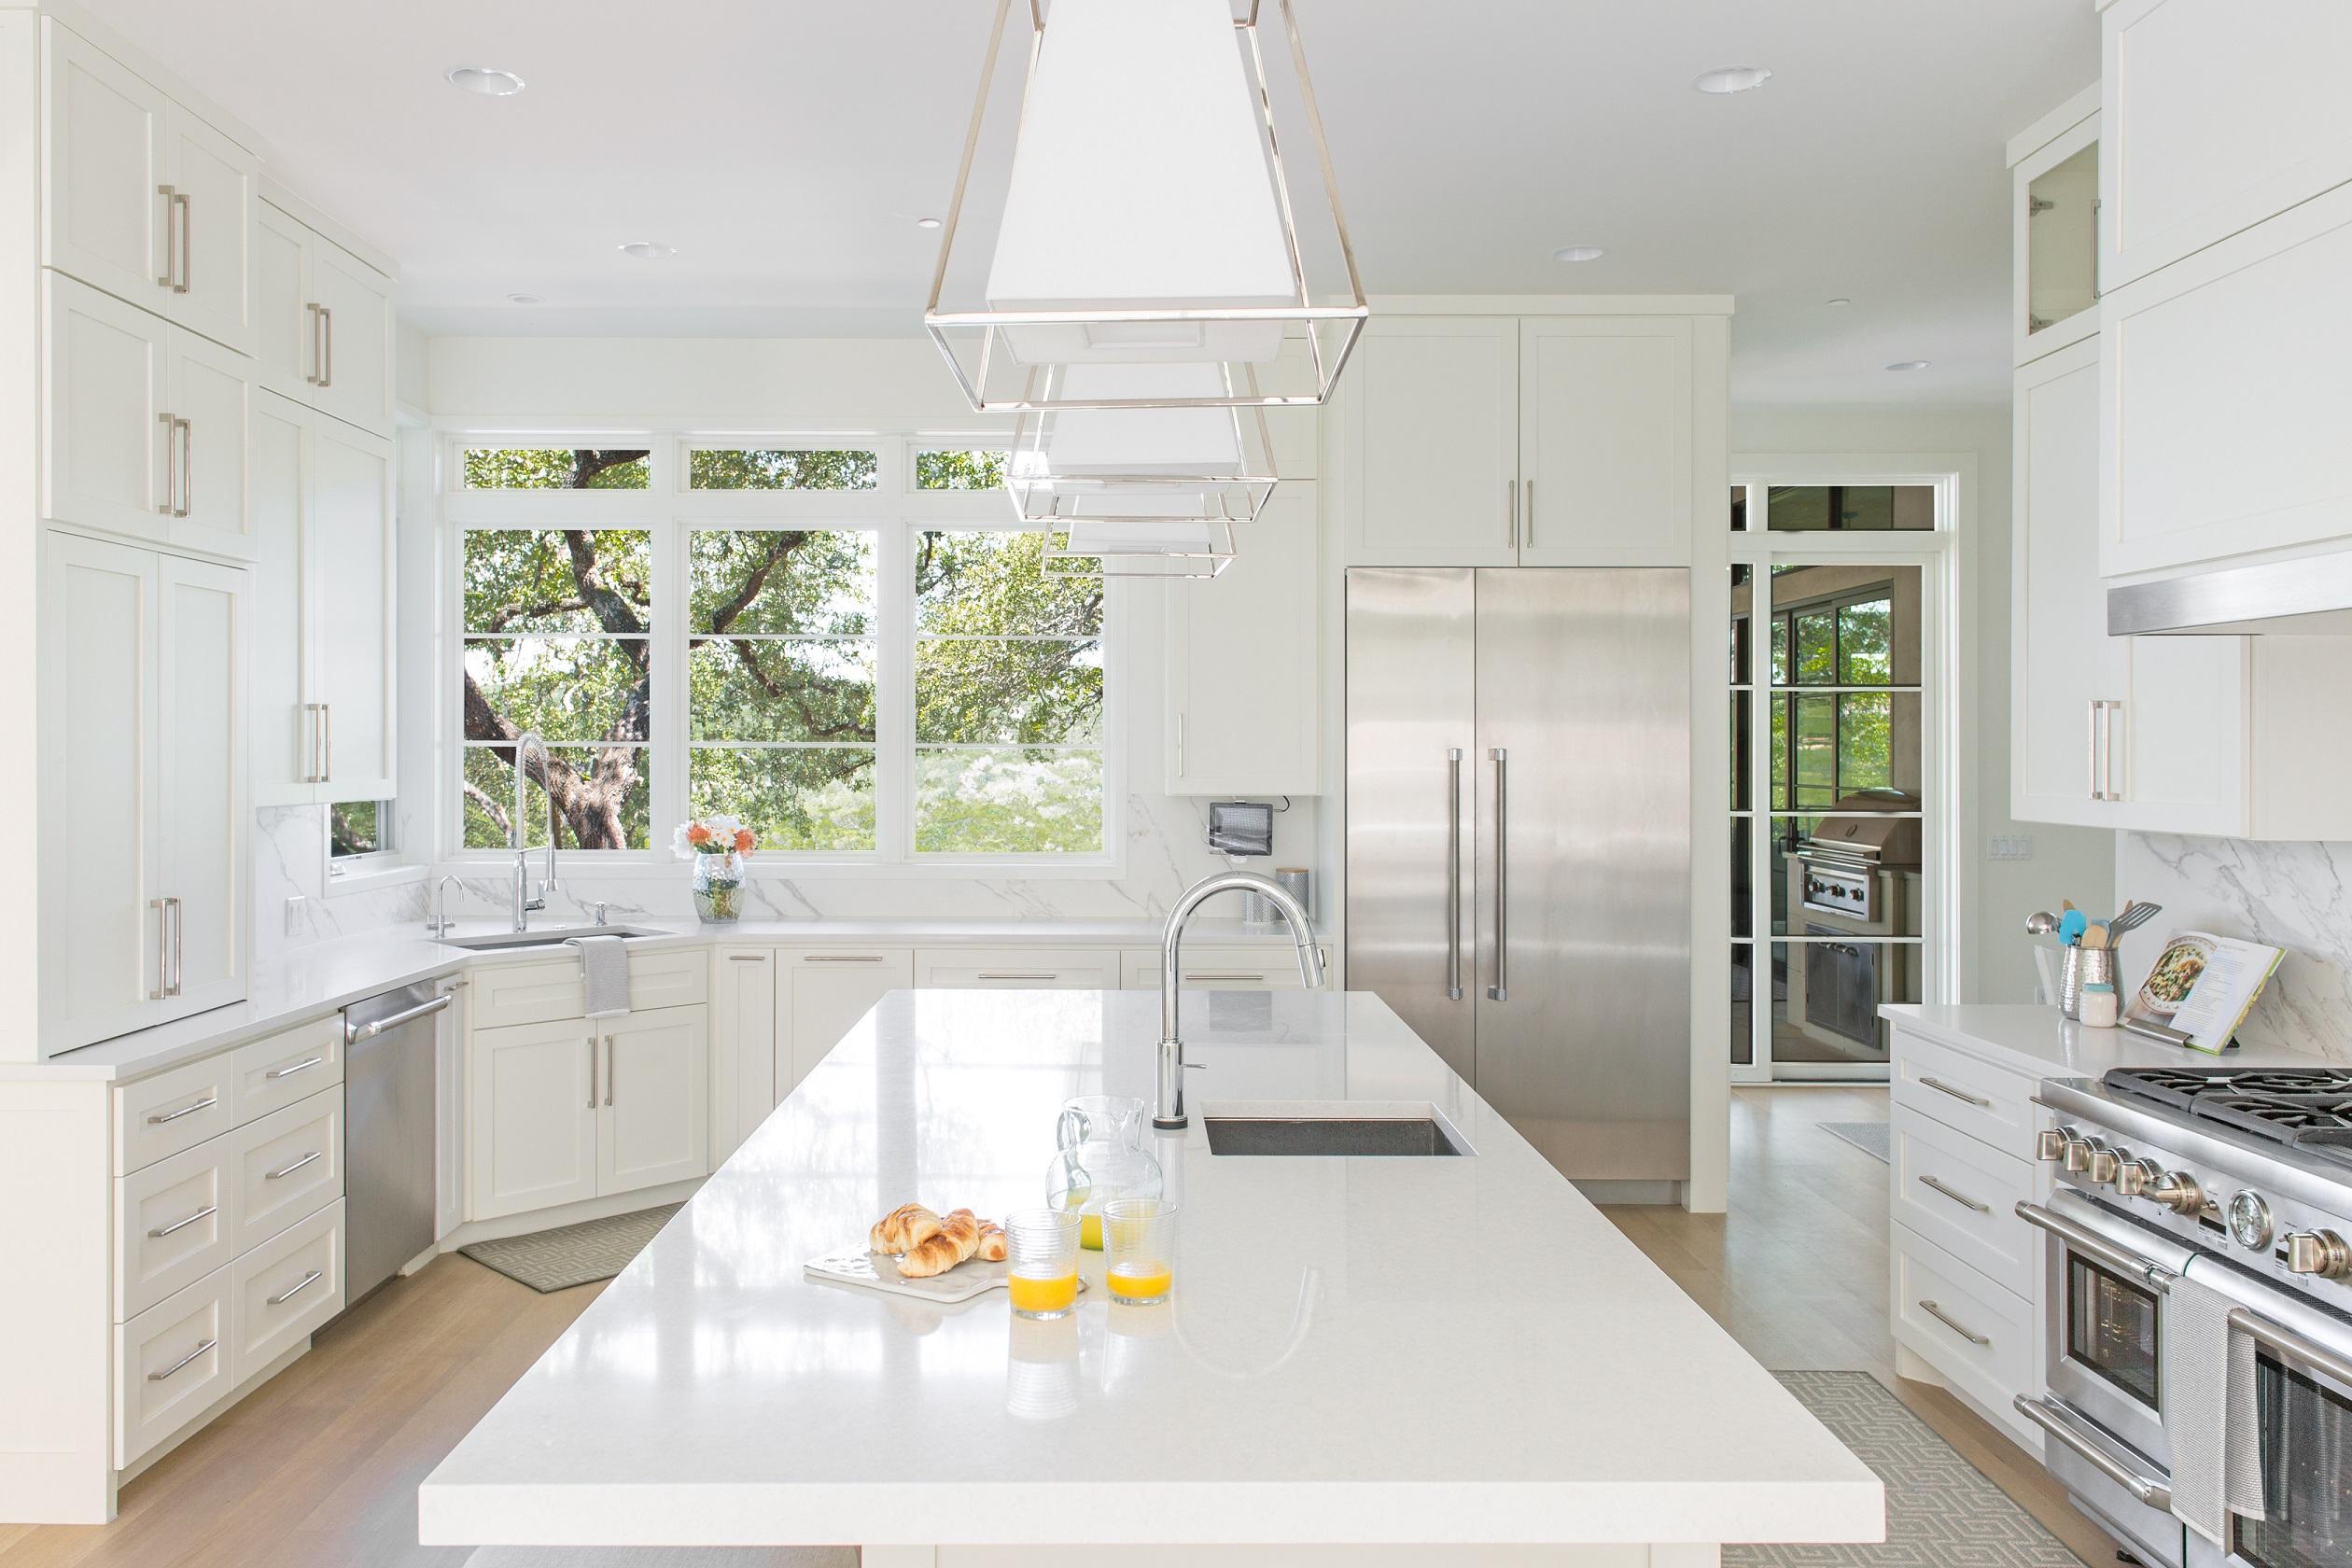 lake-austin-residence-kitchen-island